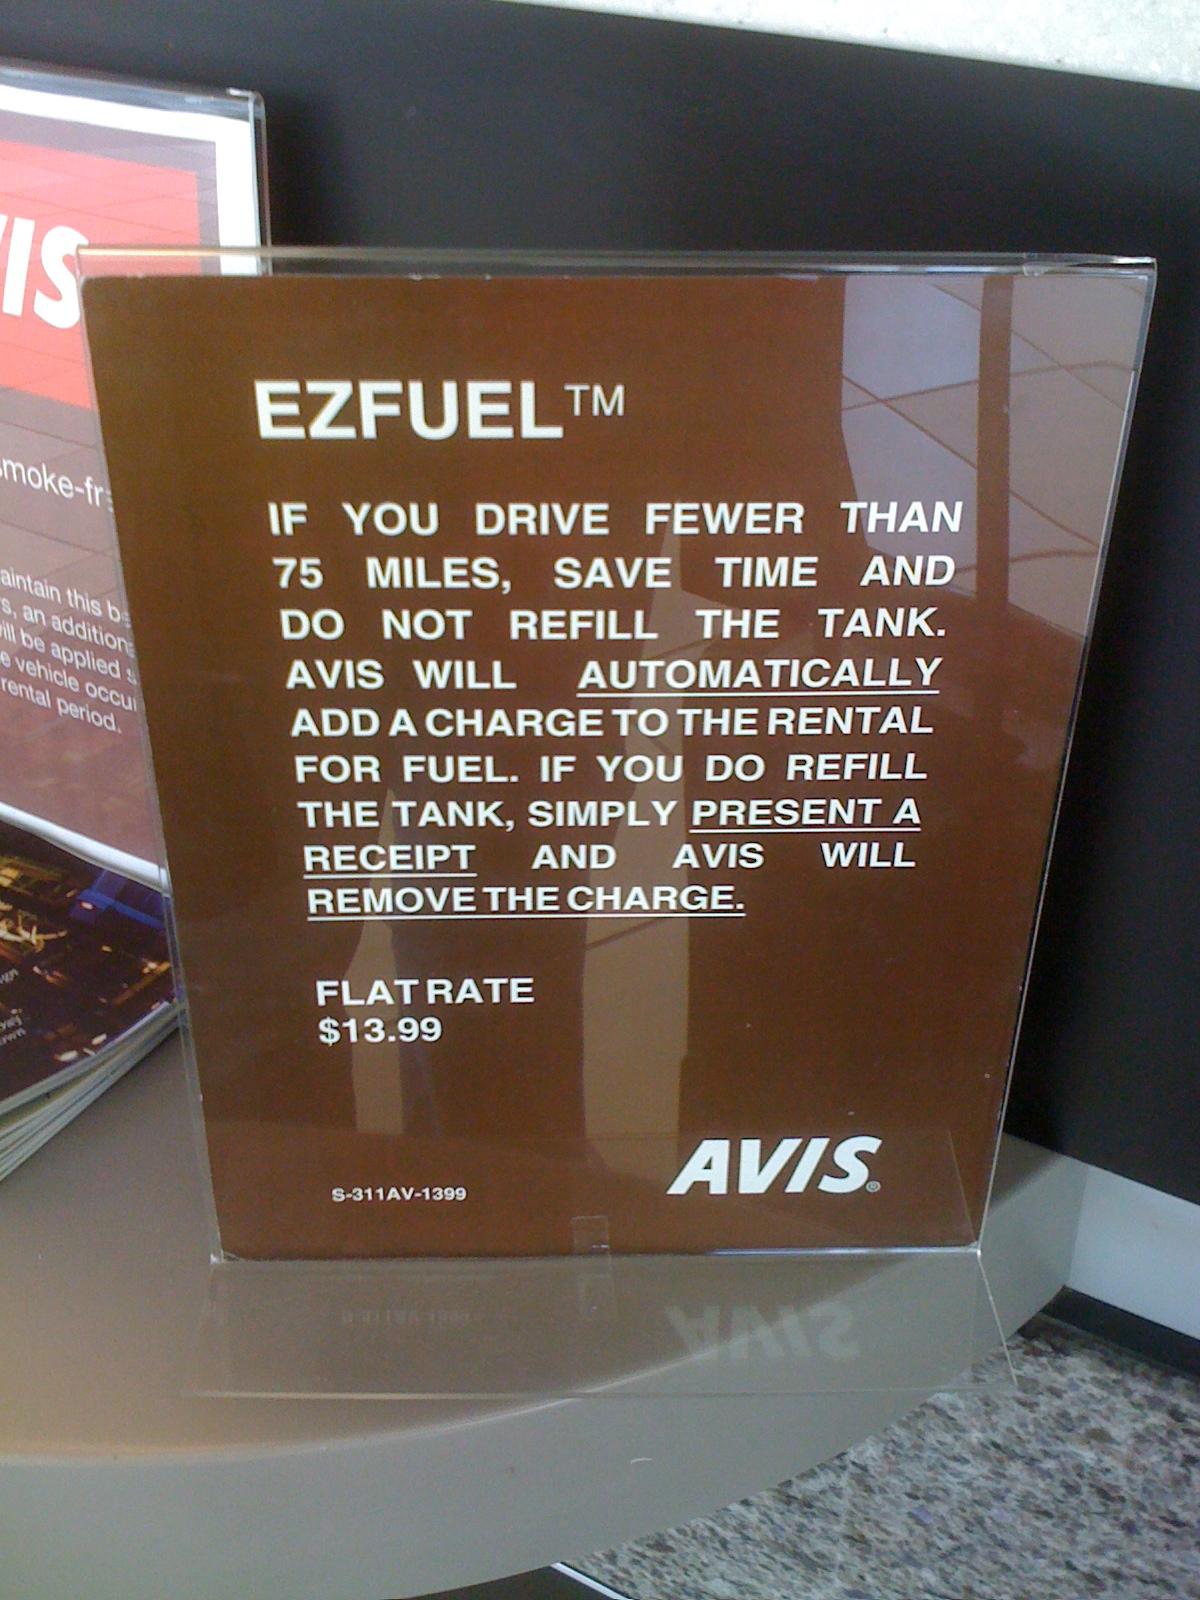 Avis EZFUEL Sign